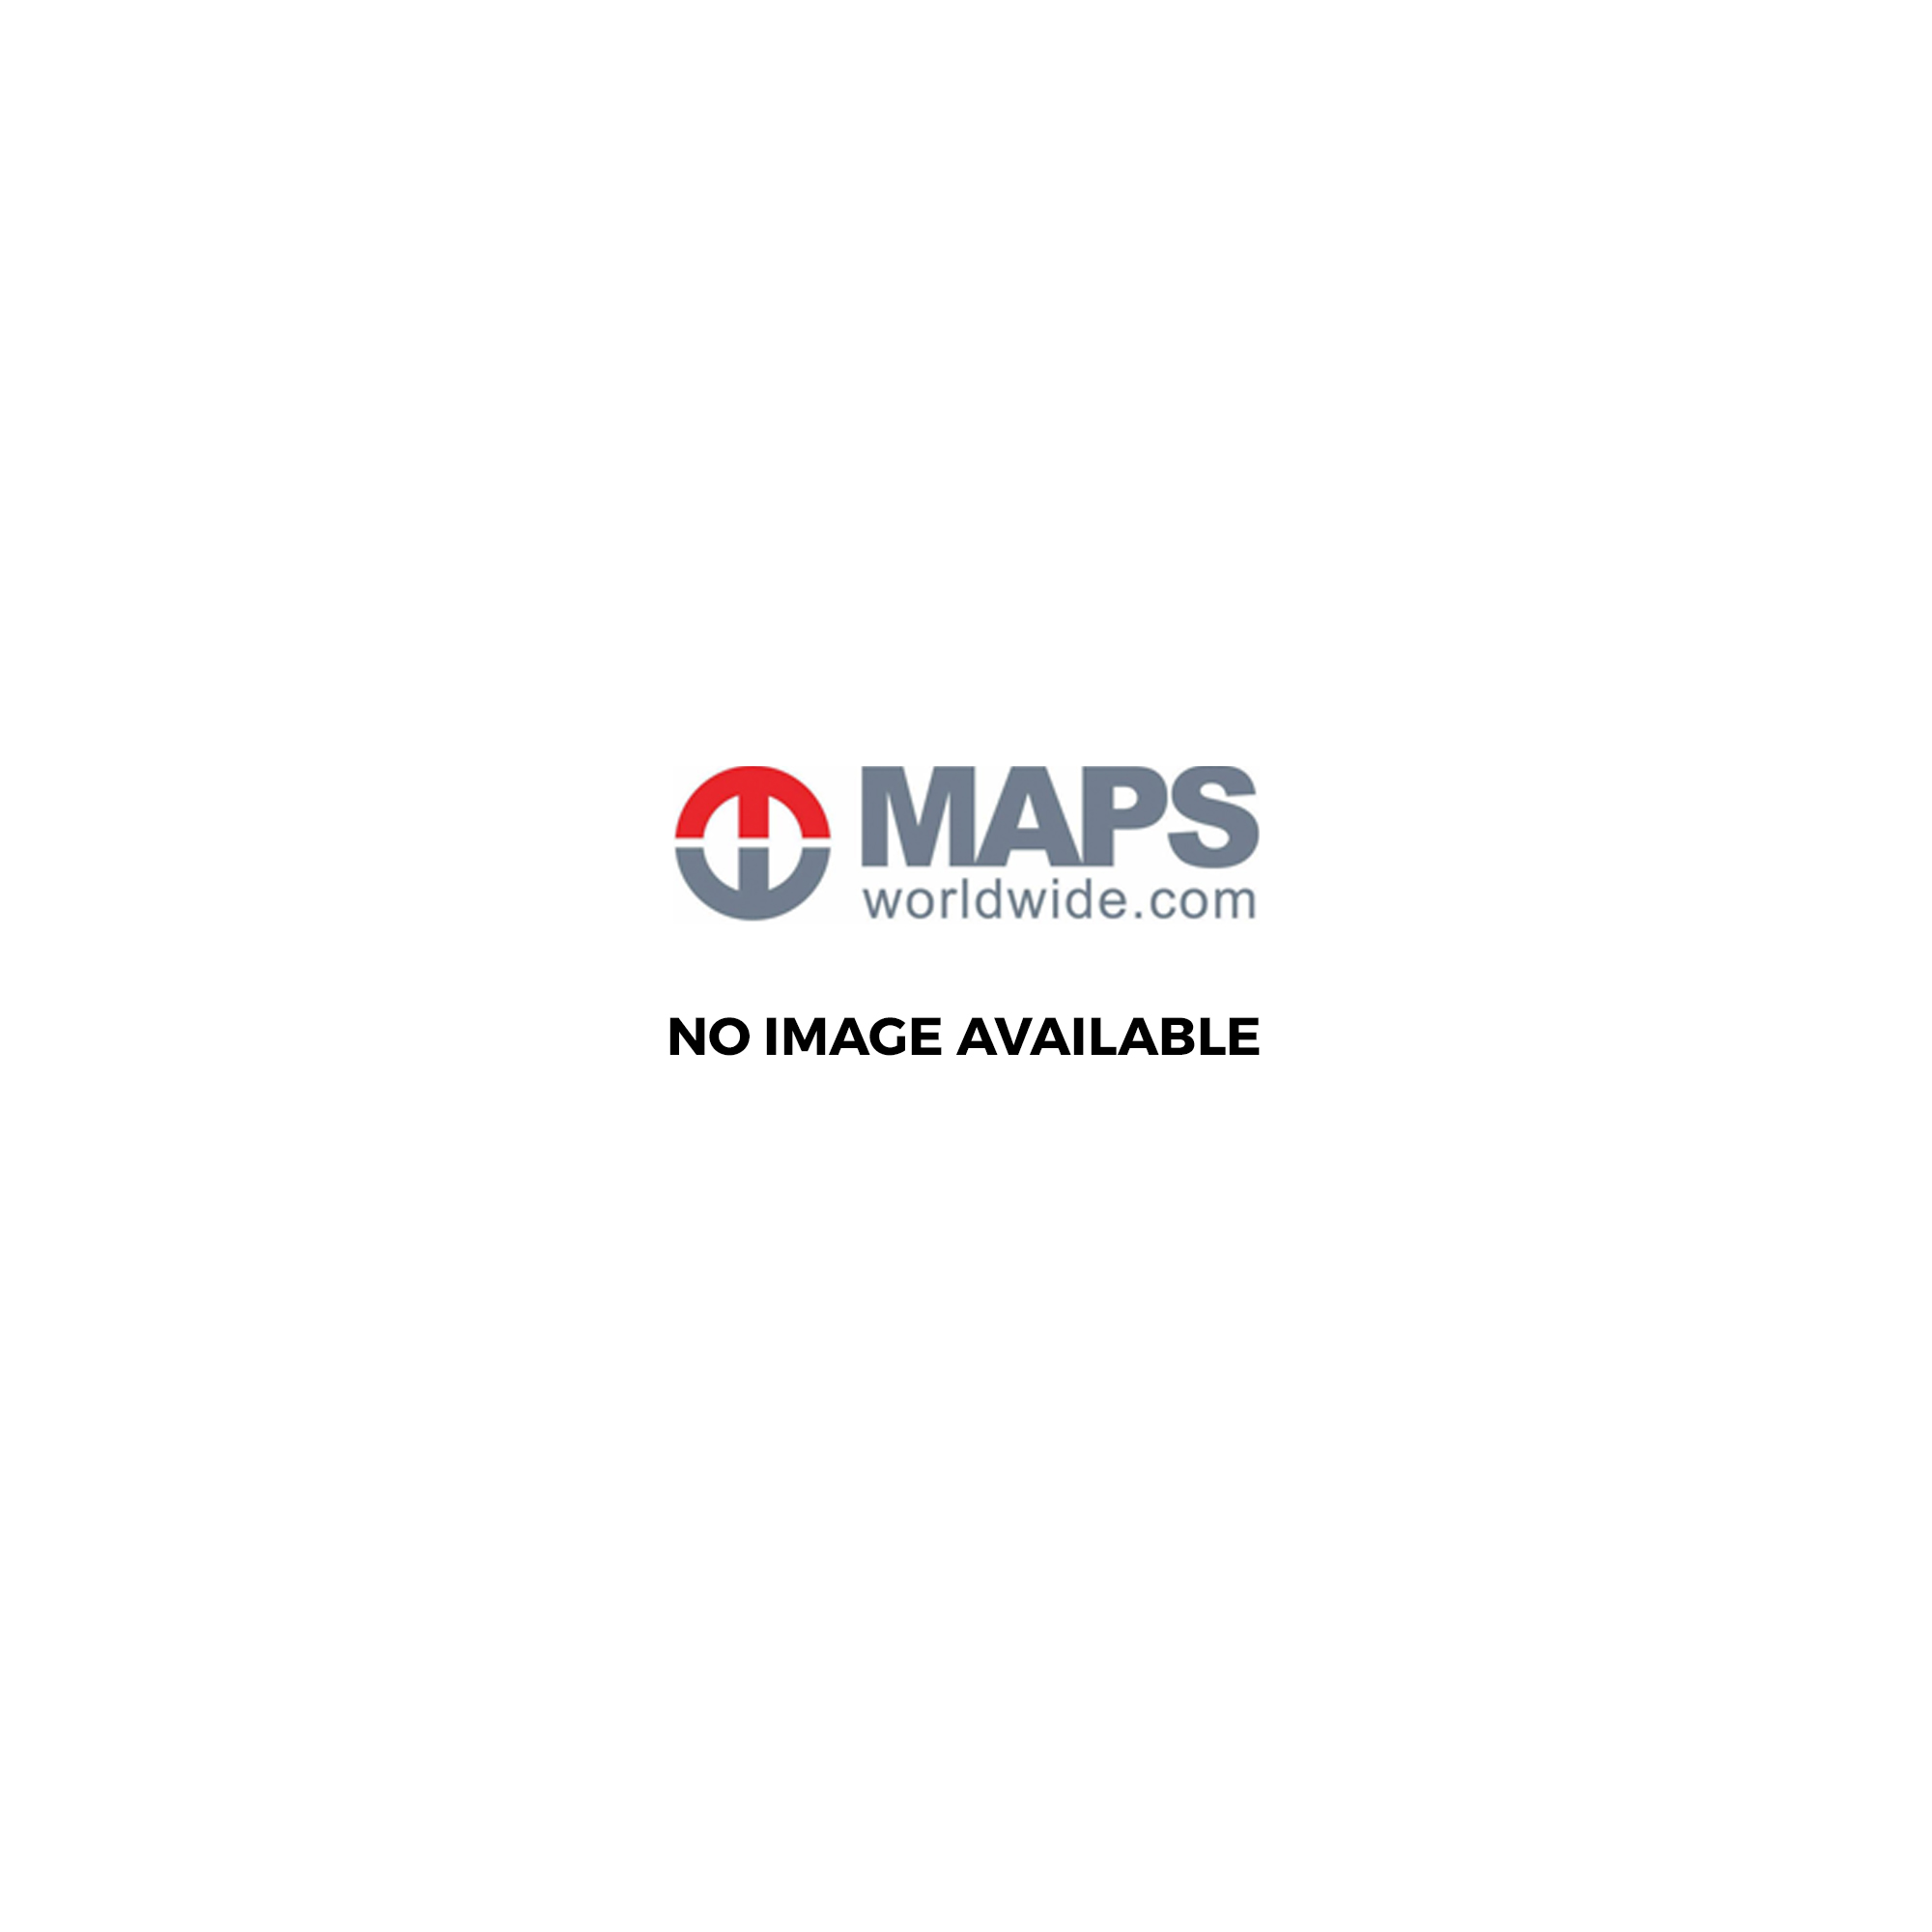 Regional road map of Germany 4: Berlin, Brandenburg, Saxony-Anhalt